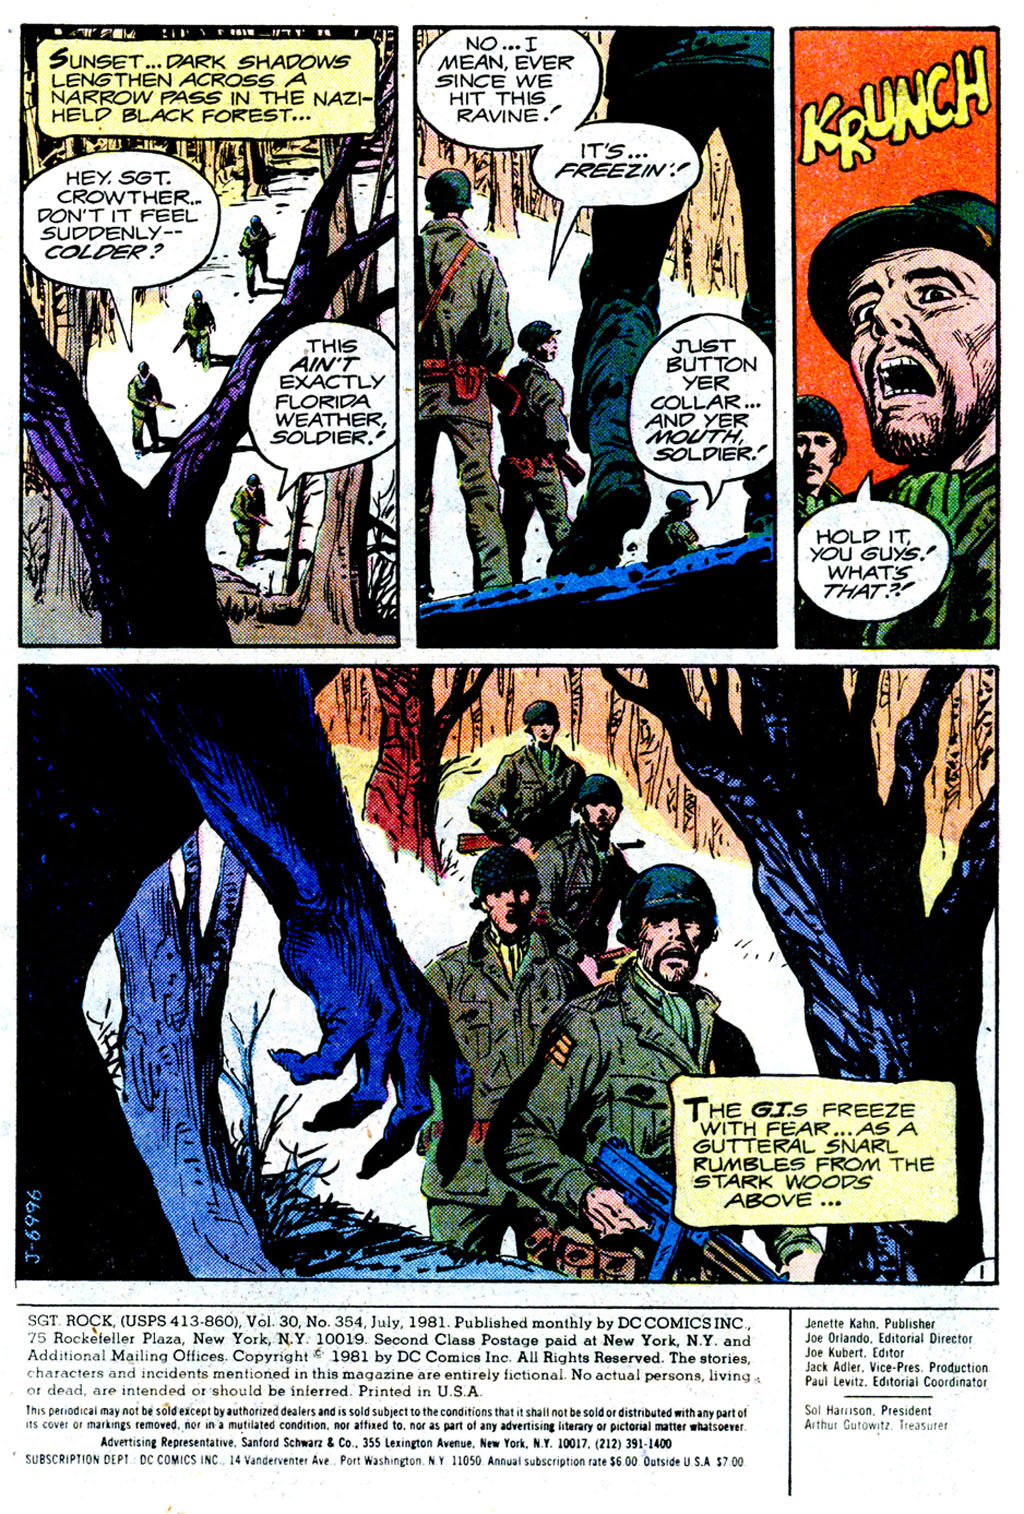 Read online Sgt. Rock comic -  Issue #354 - 2